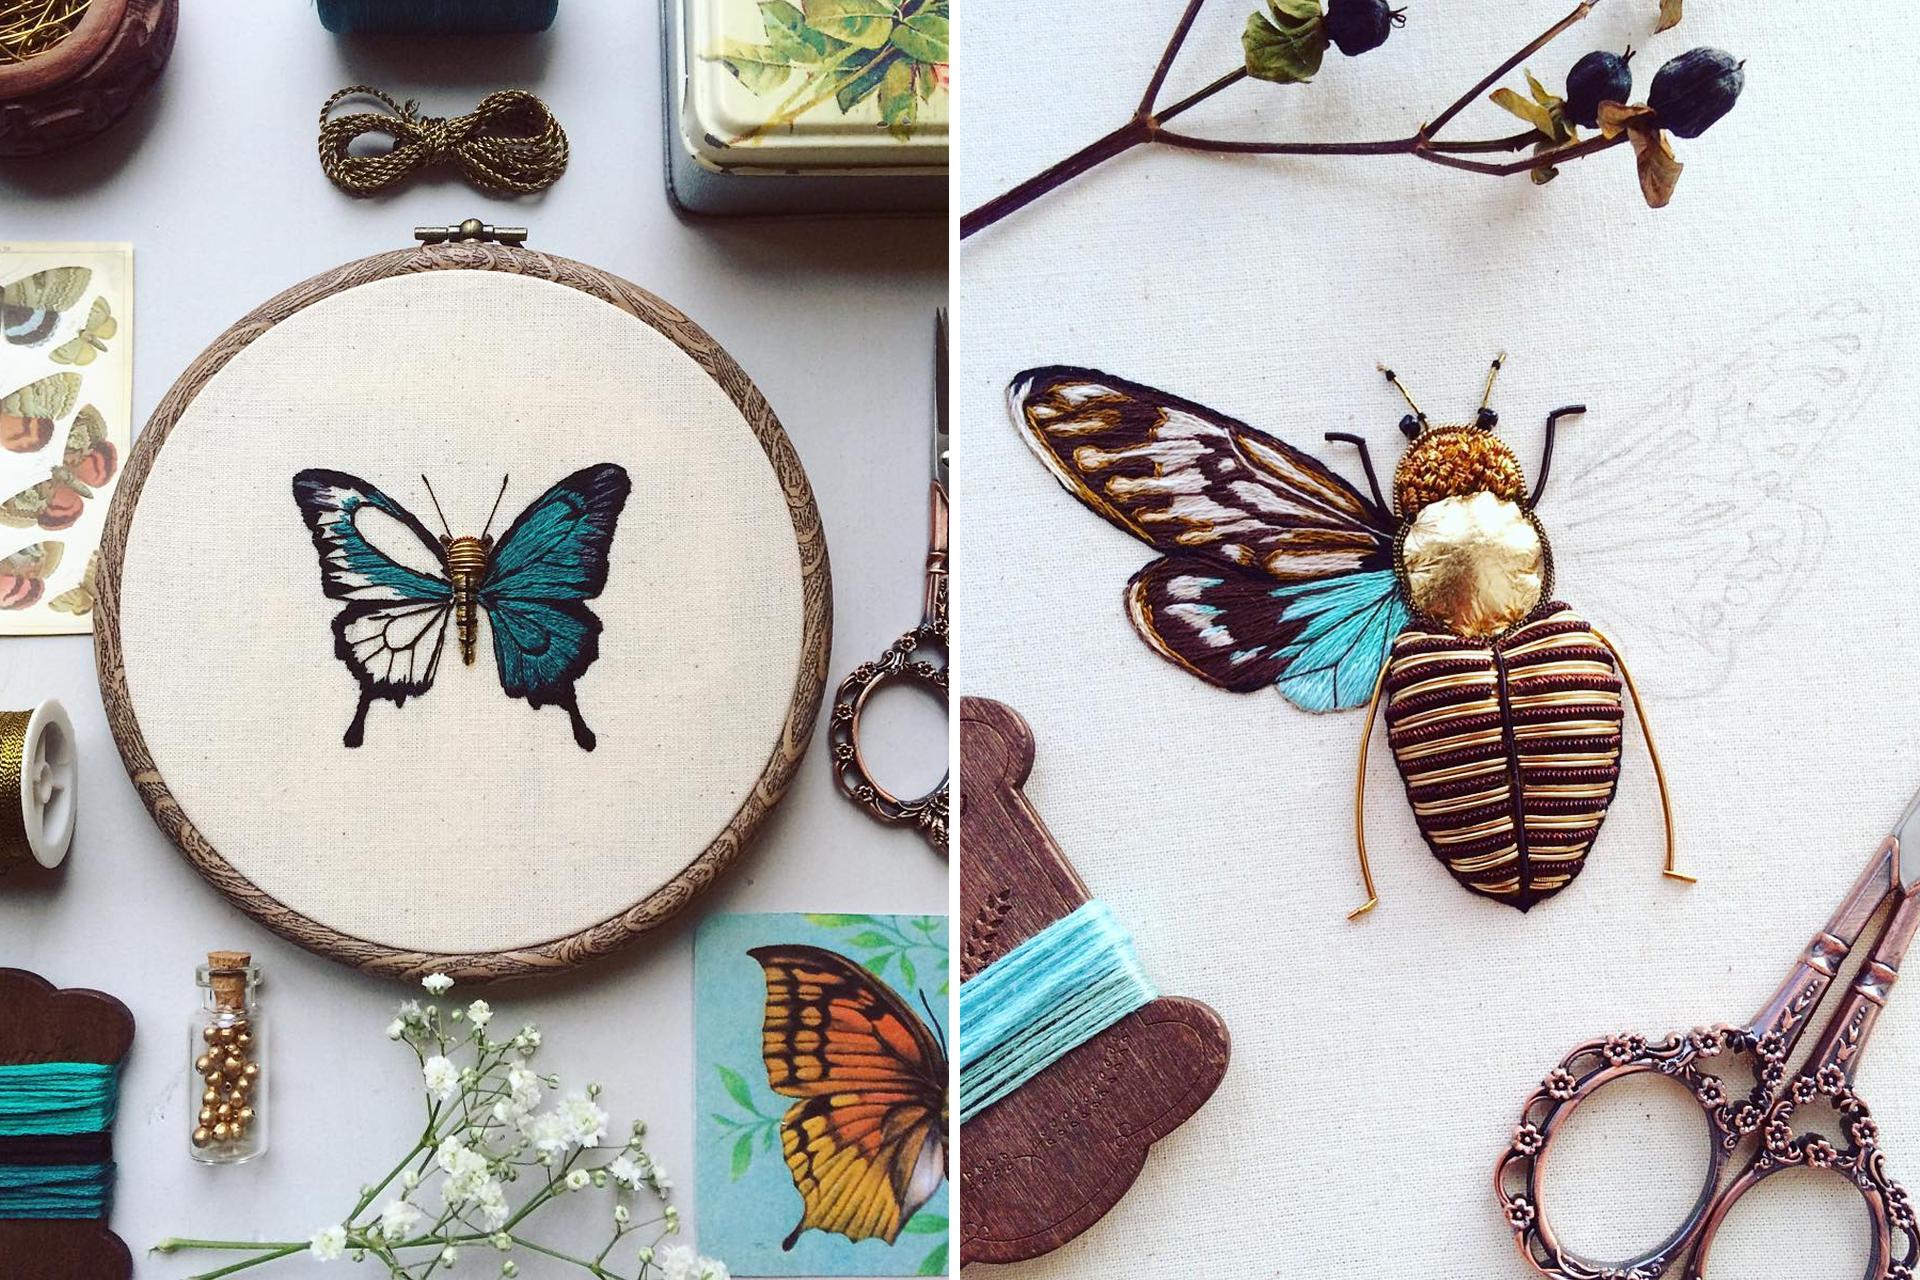 insects_humayrah_bint_altaf_Koel Stories.jpg